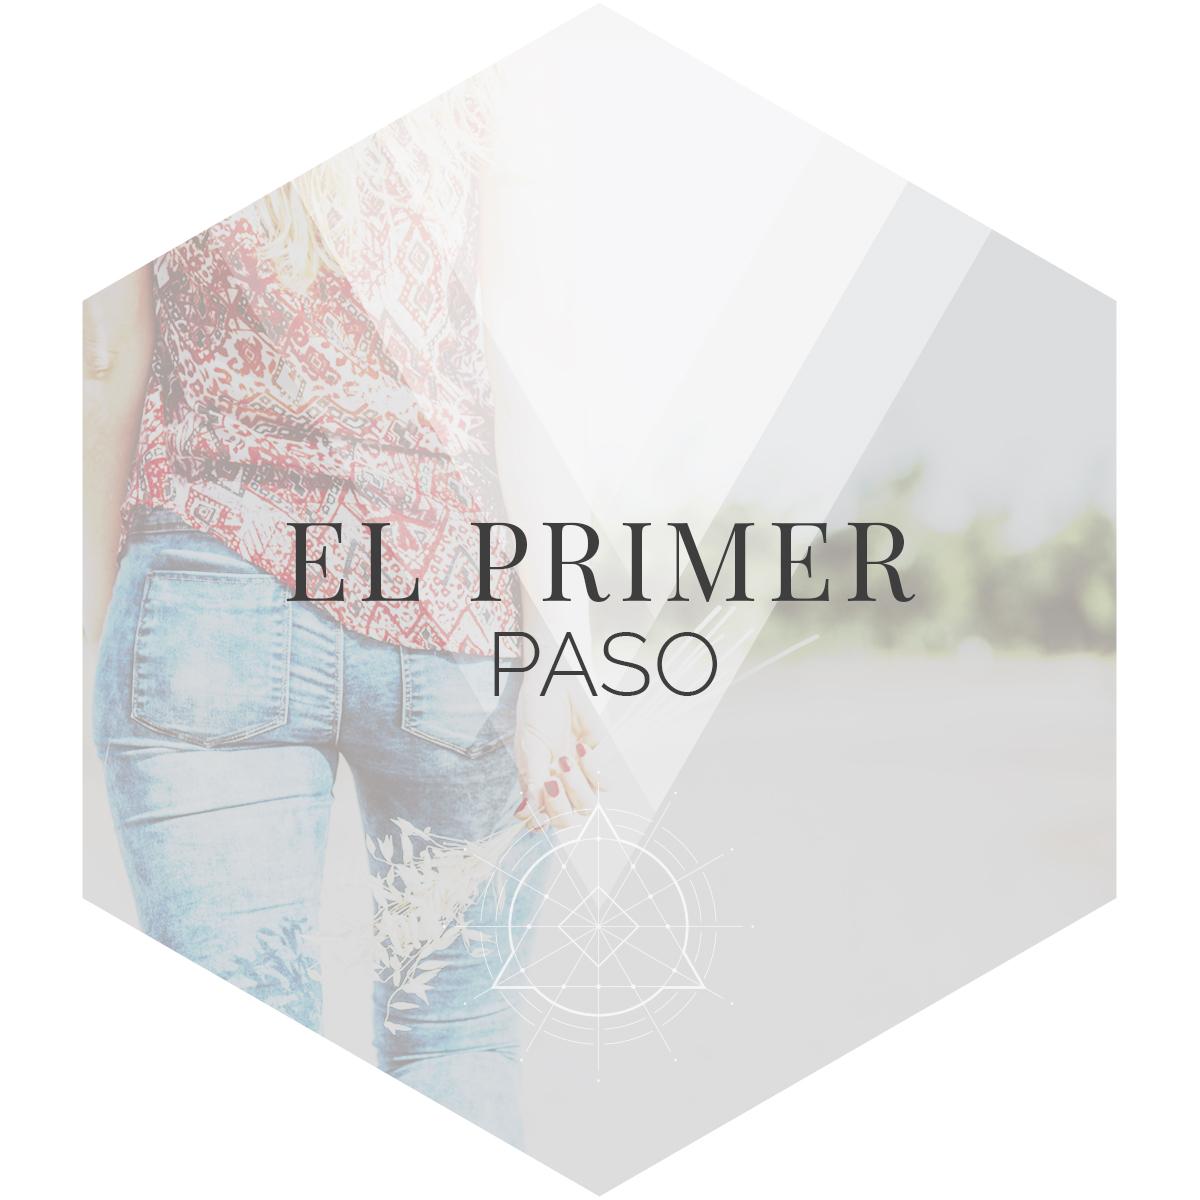 PRIMER_PASO_HEXAGONO.jpg